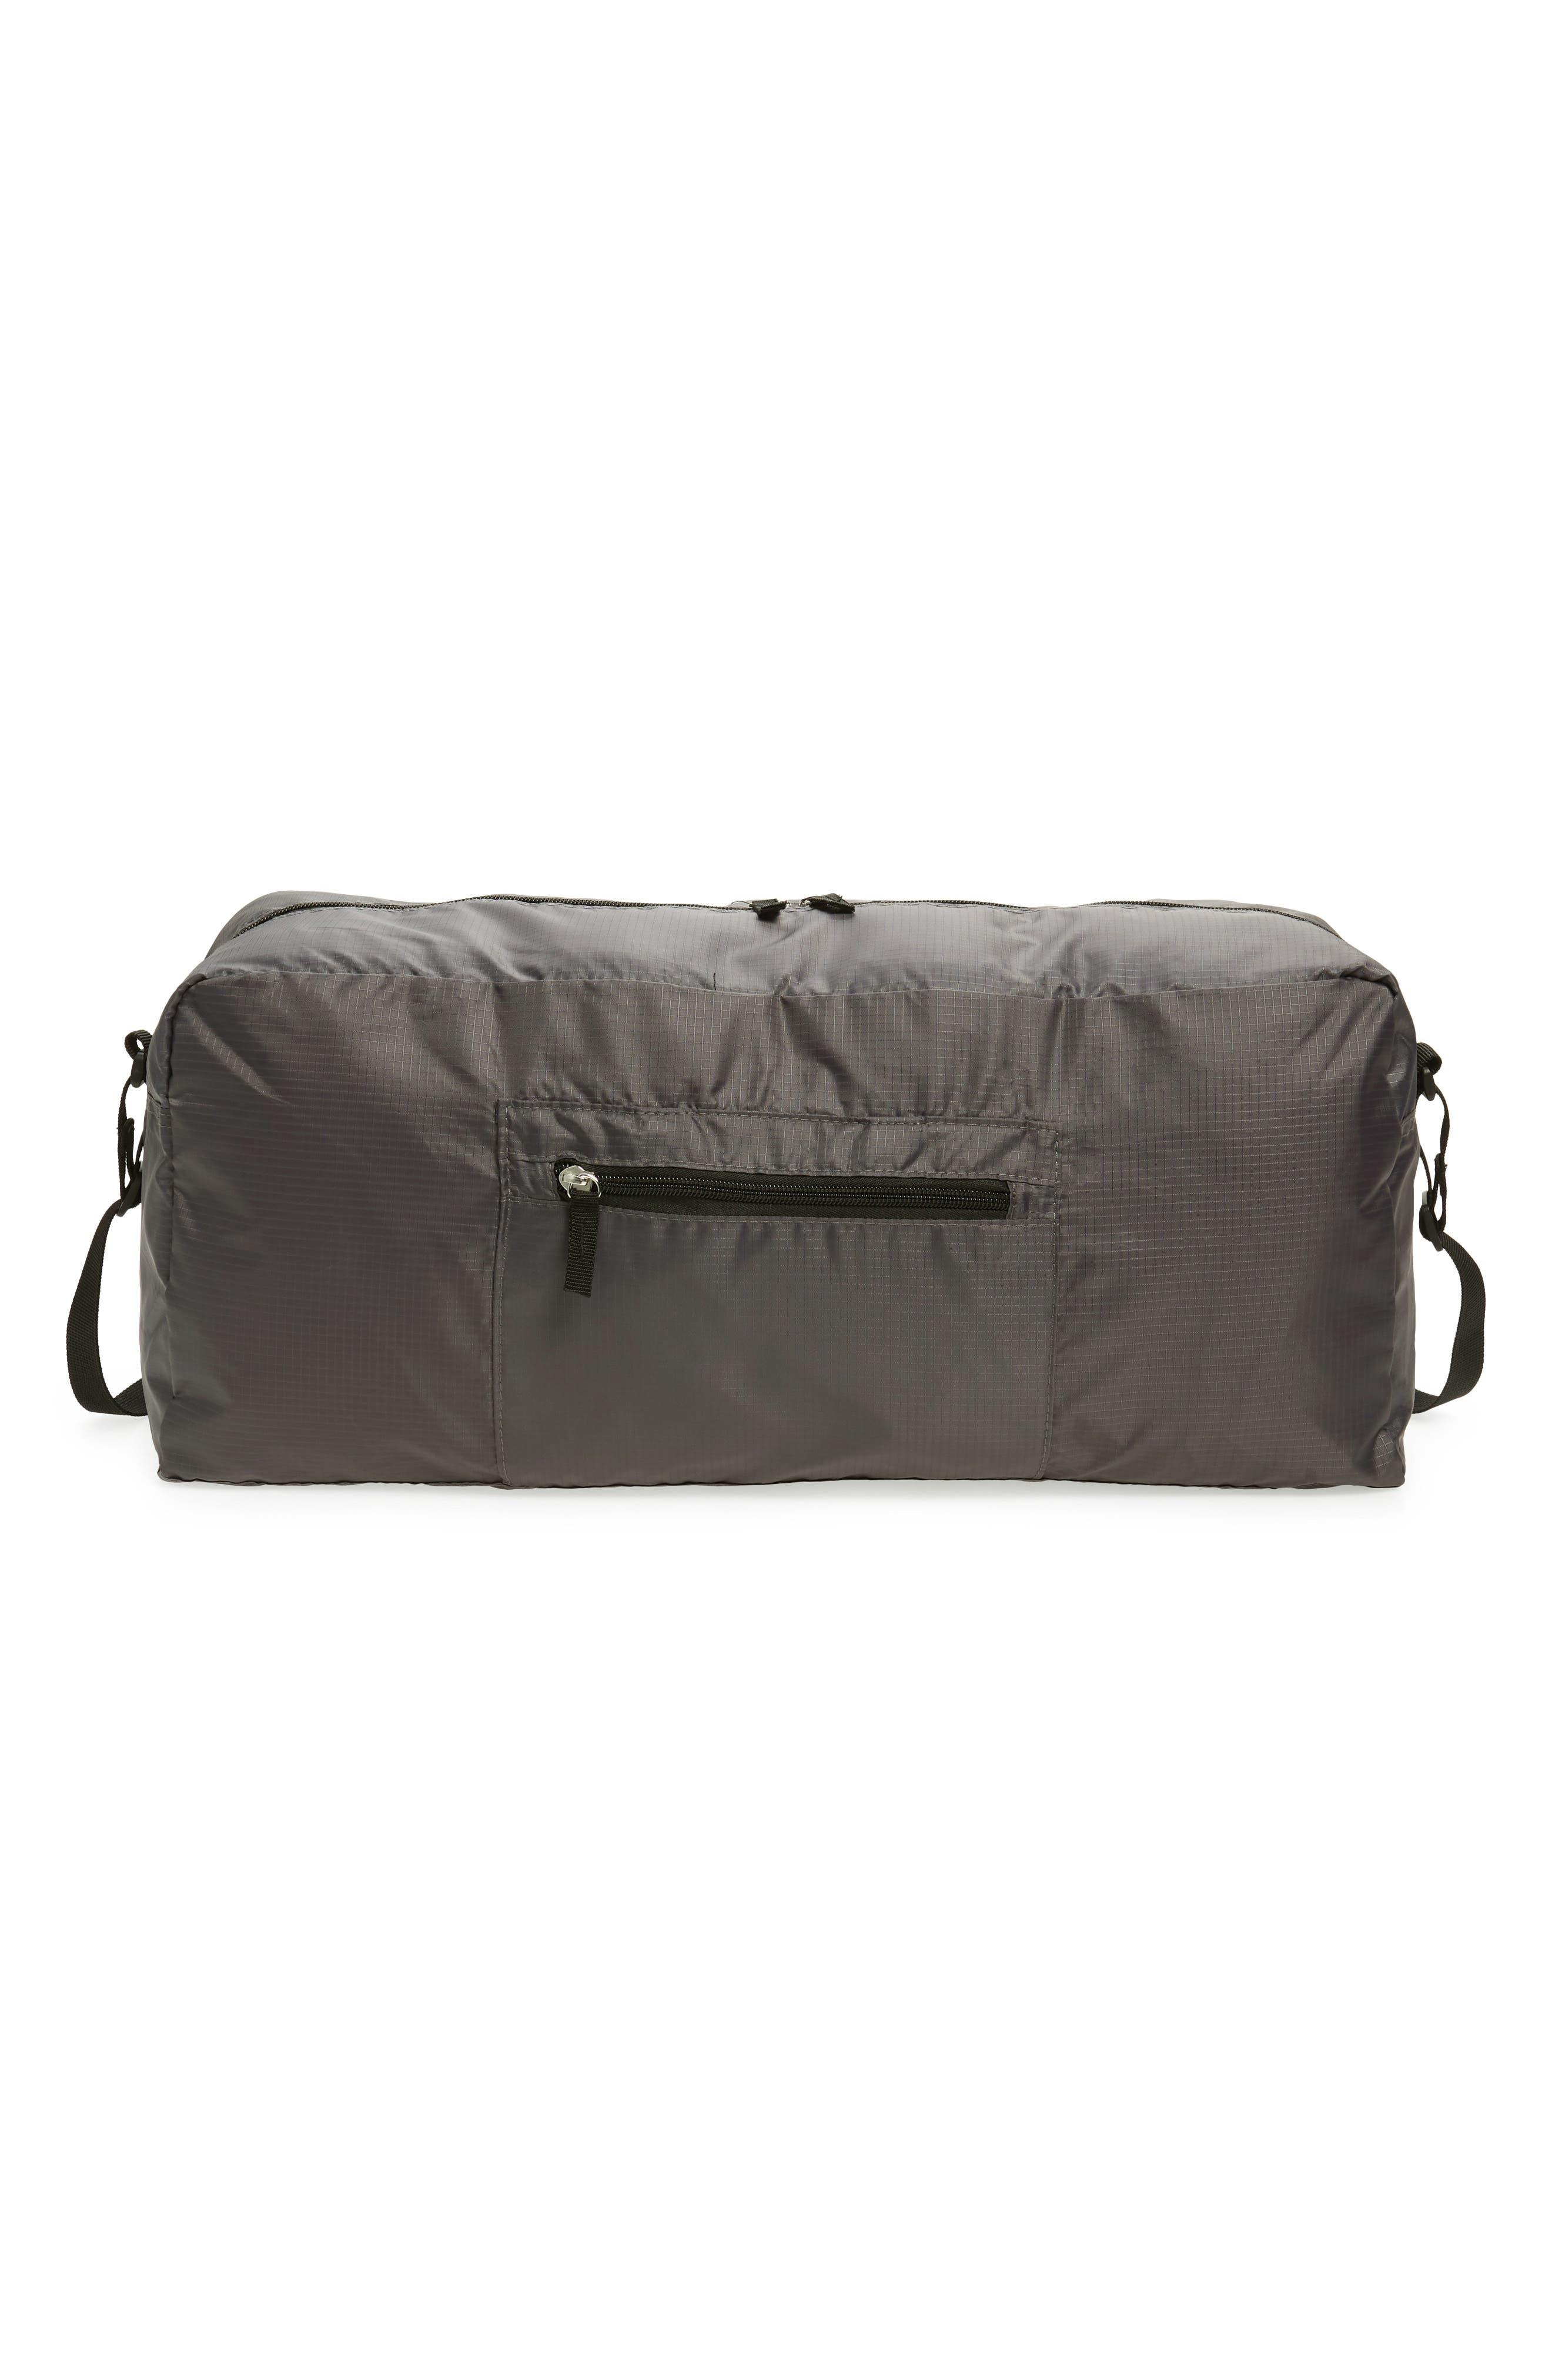 Packable Convertible Ripstop Duffle Bag